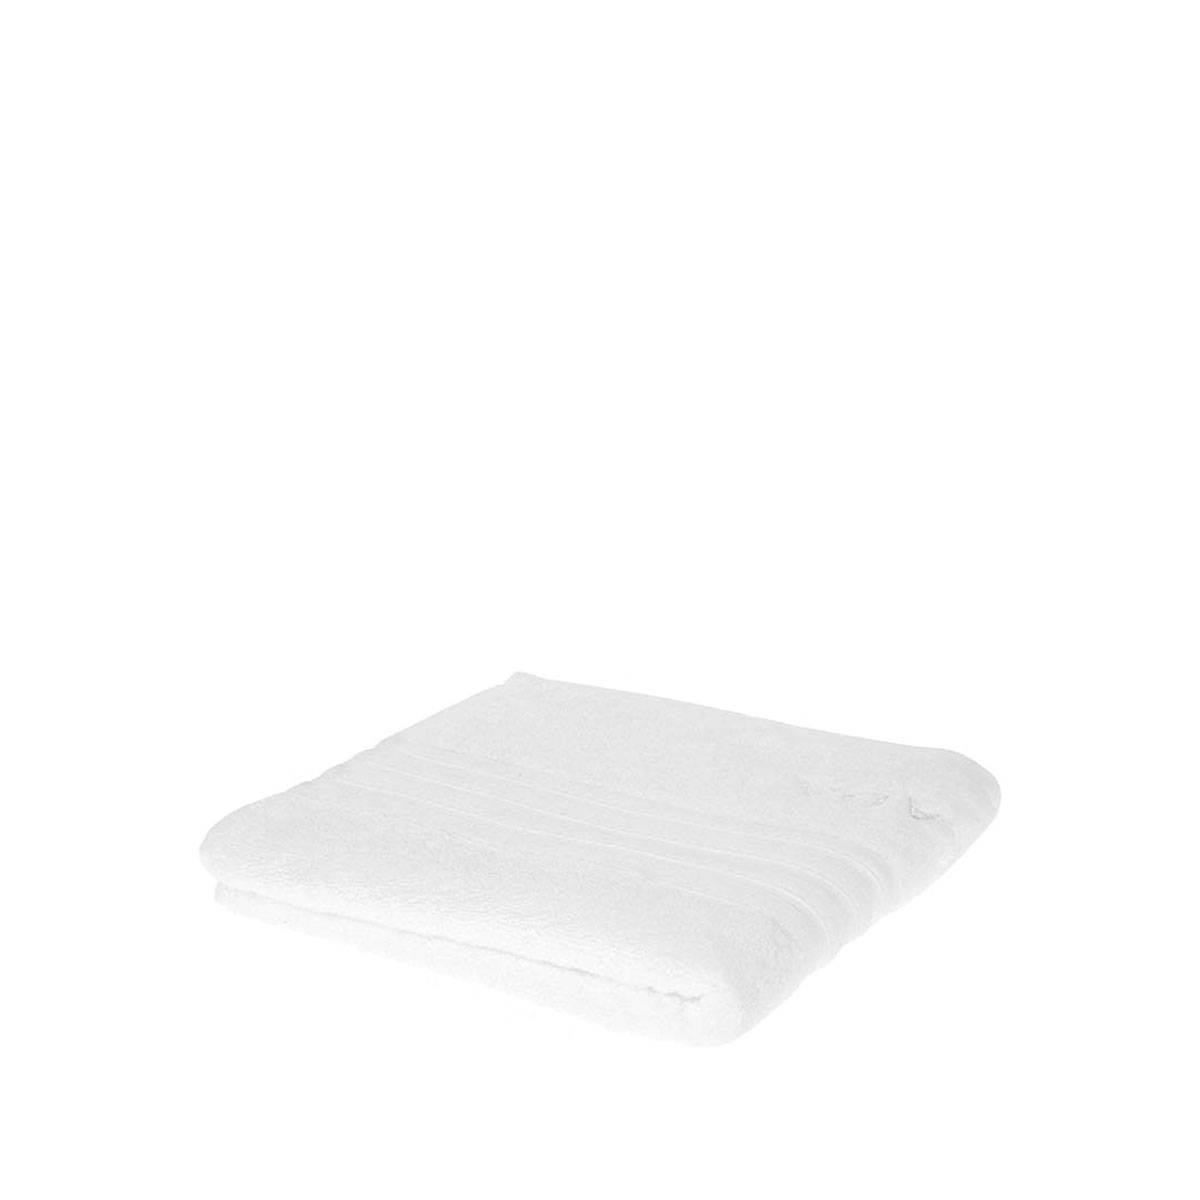 Asciugamano Spugna Cotone 12pz 50x90cm Bianco W014**